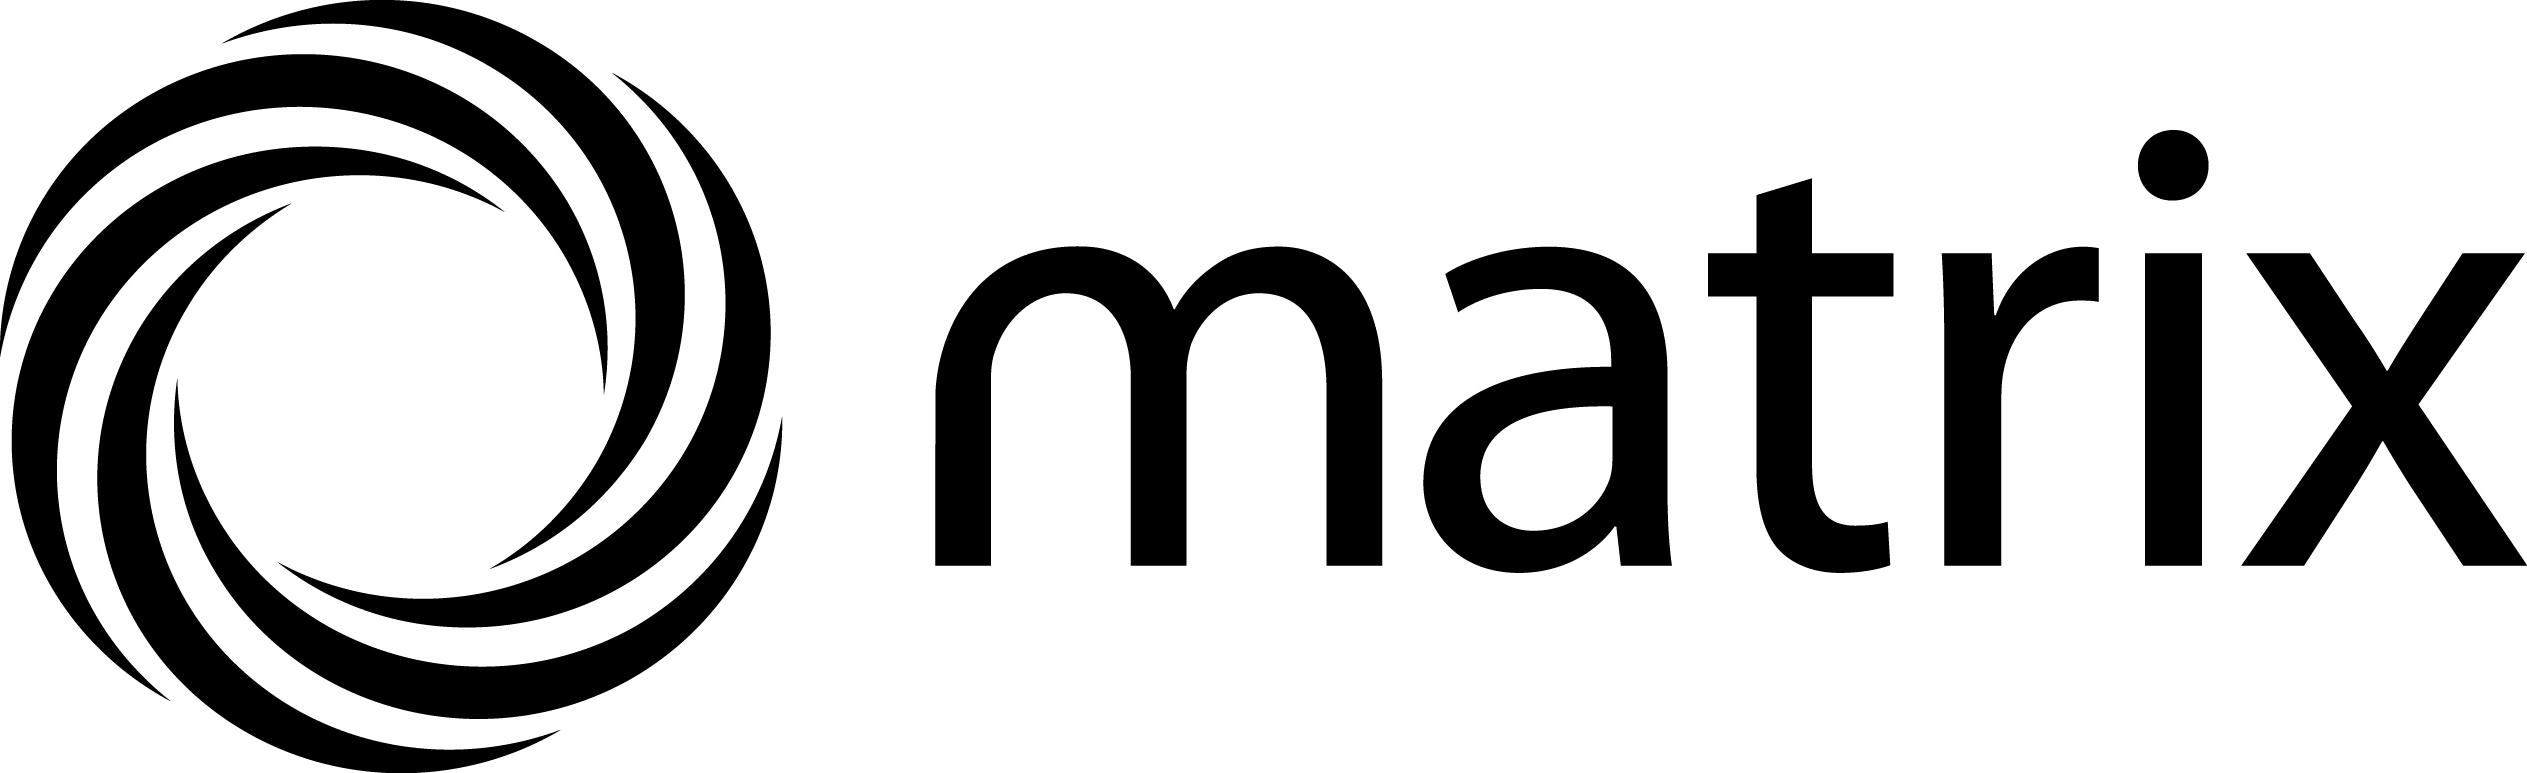 Matrix-2012-logo-White-Background.jpg